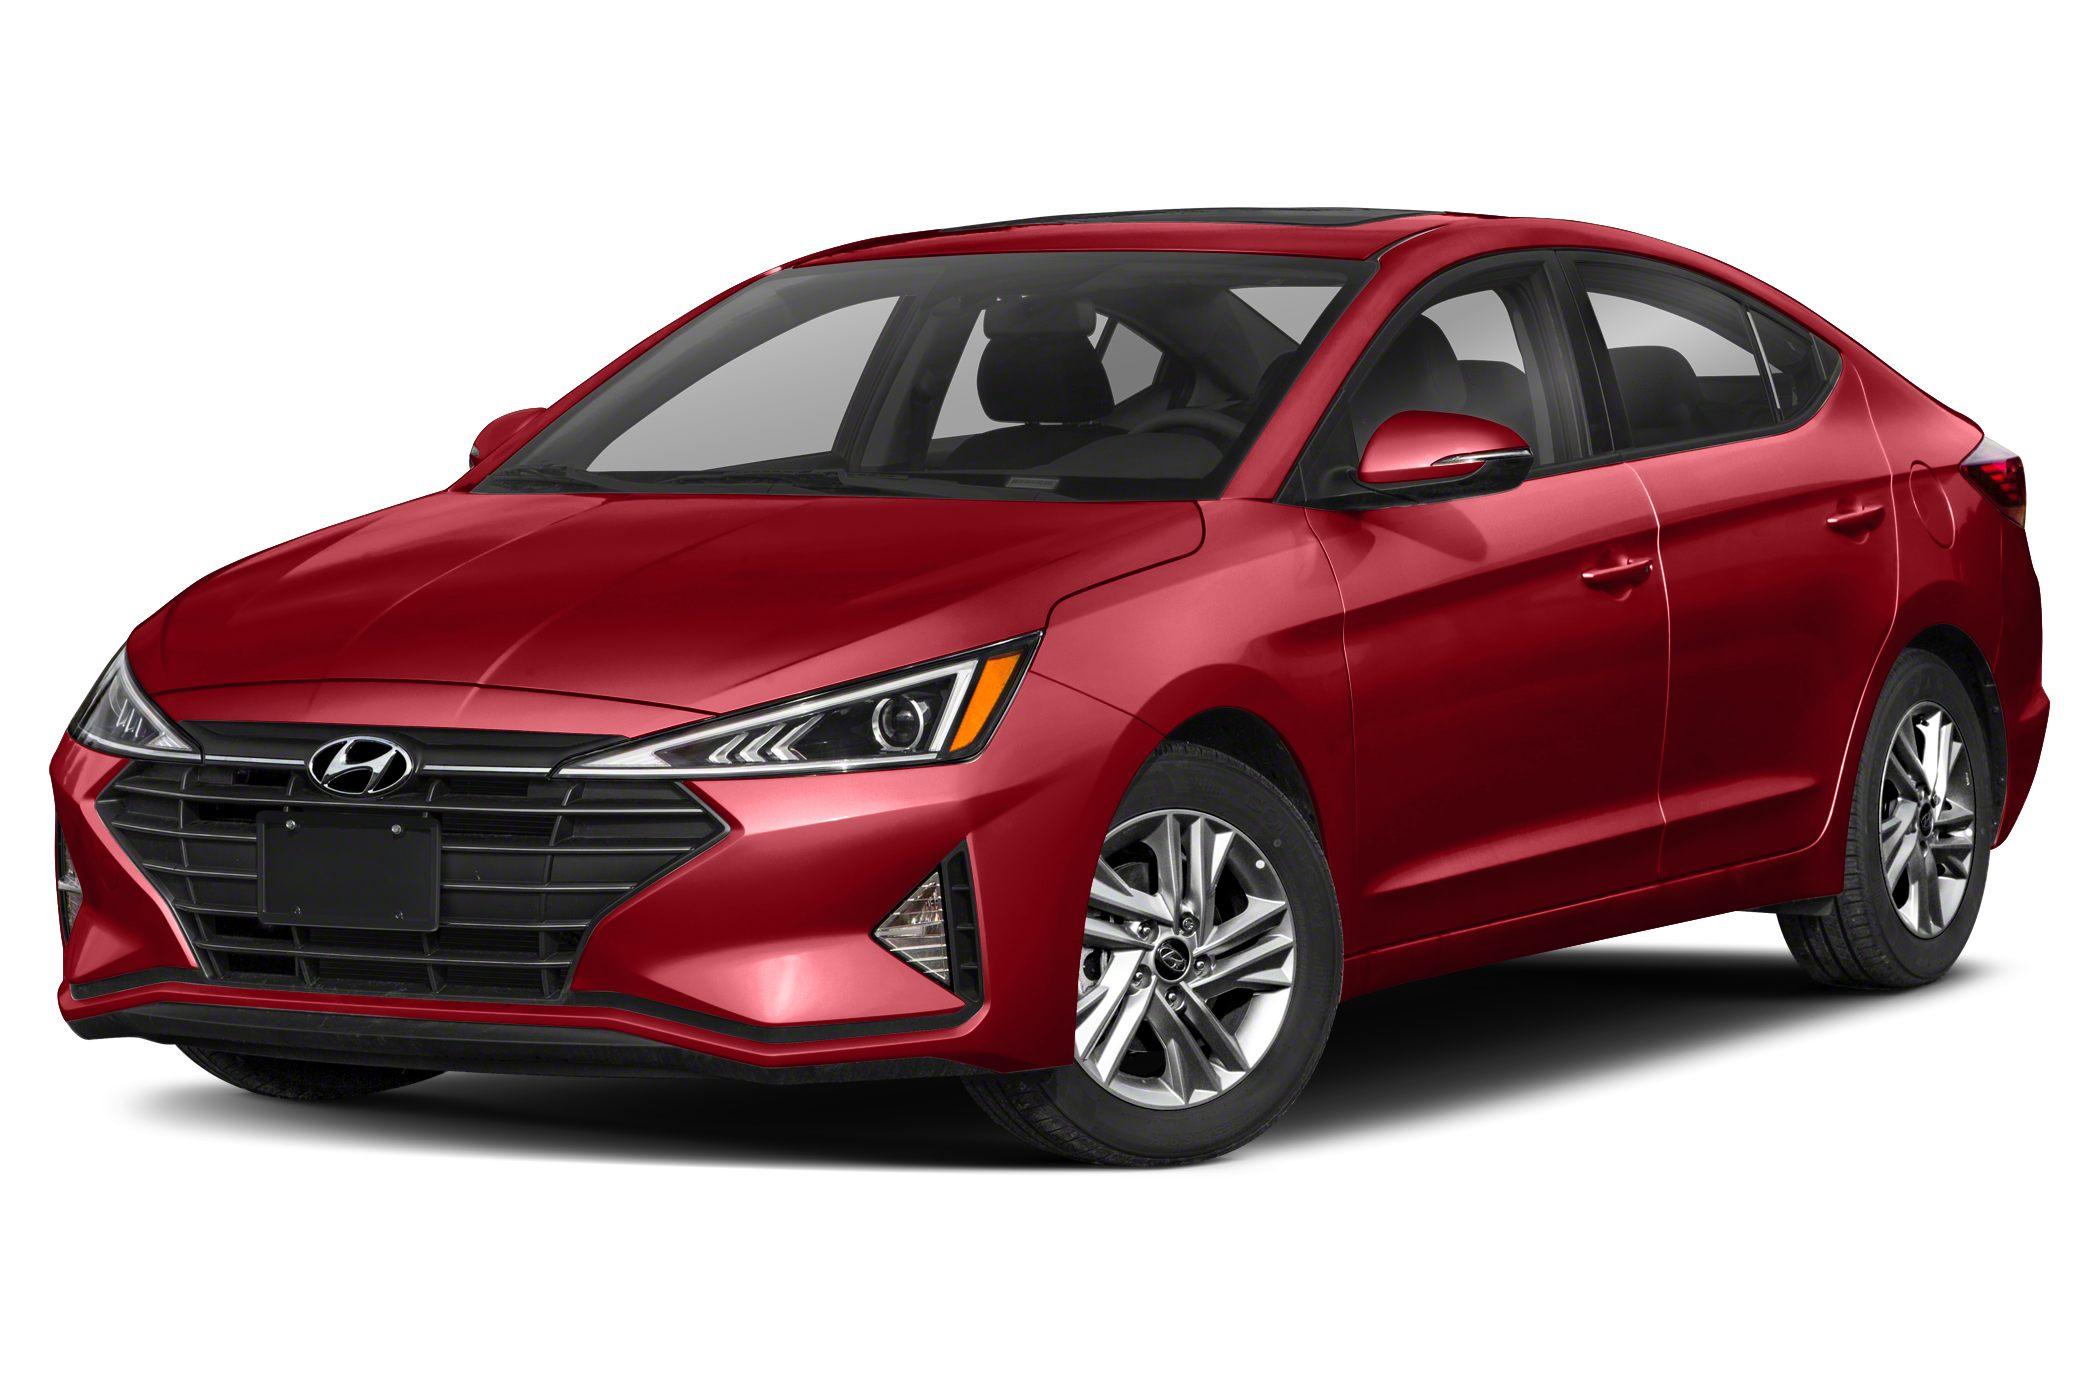 2020 Hyundai Elantra Se 4dr Sedan Pictures